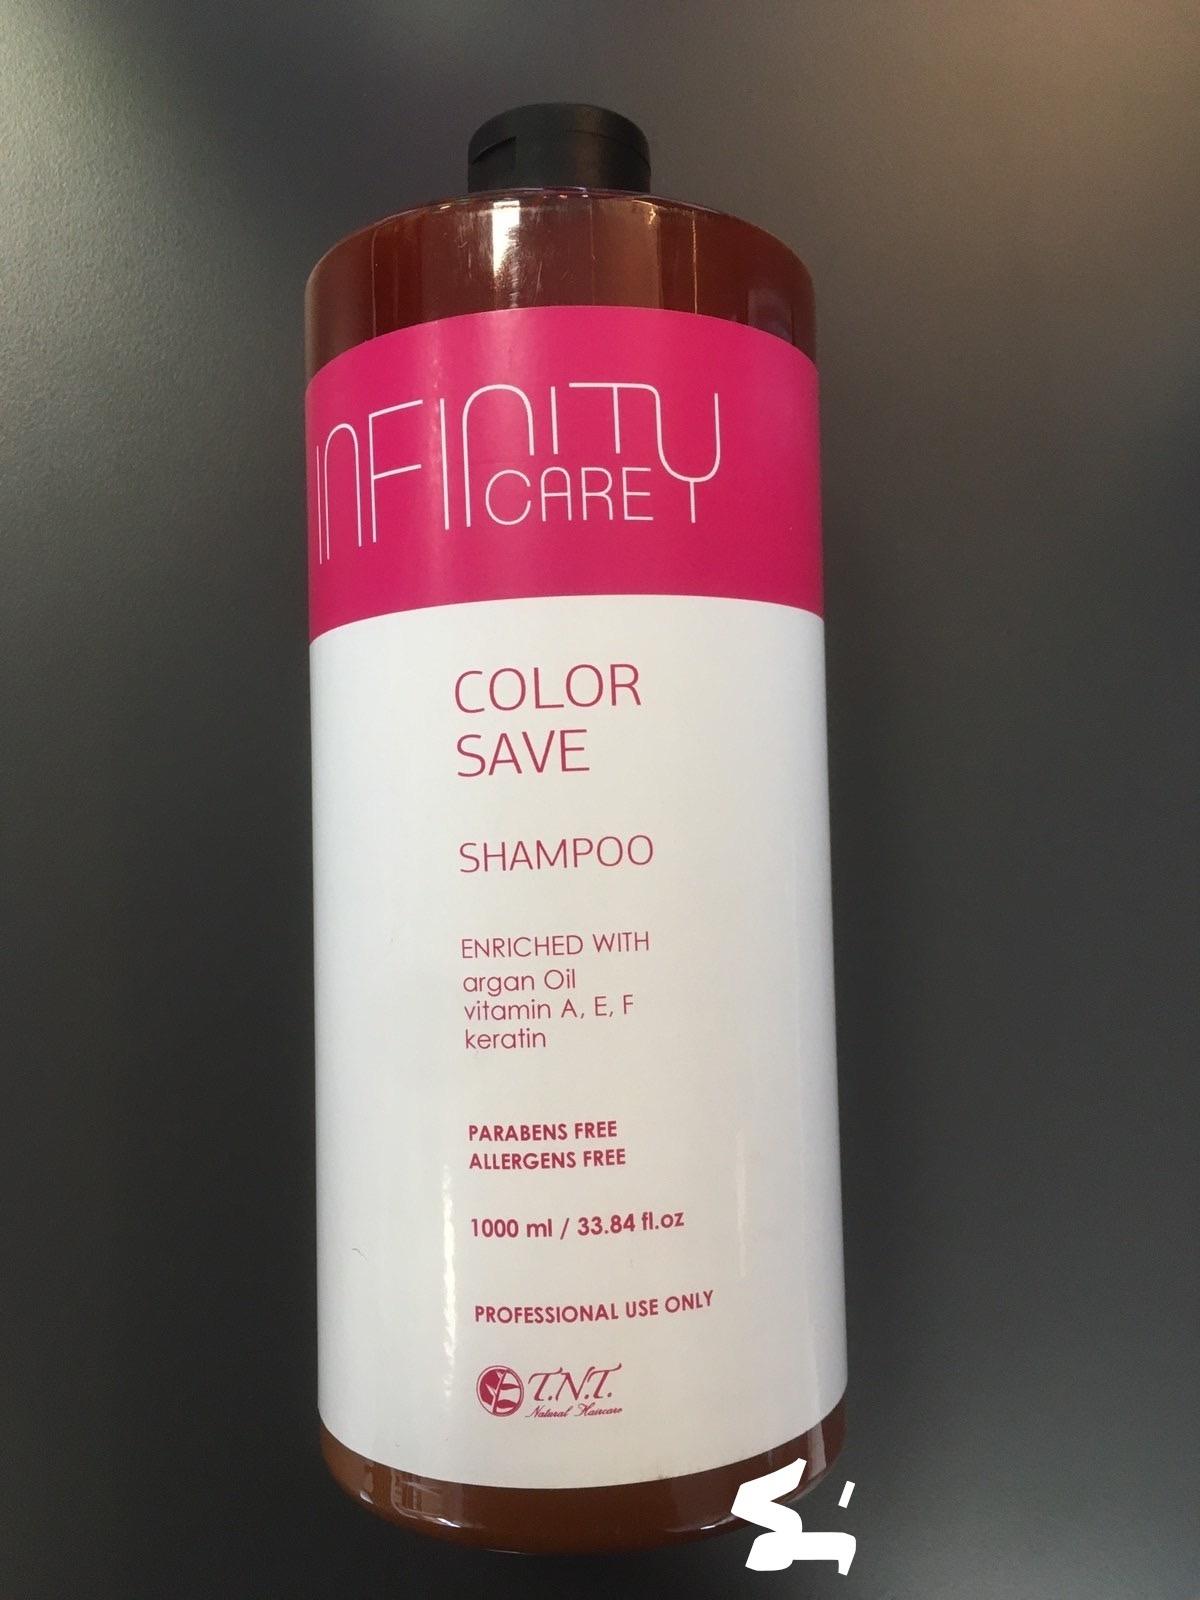 ШАМПОАН ЗА ЗАЩИТА НА ЦВЕТА ЗА БОЯДИСАНА КОСА Infinity Care Color Save Shampoo 1000ml